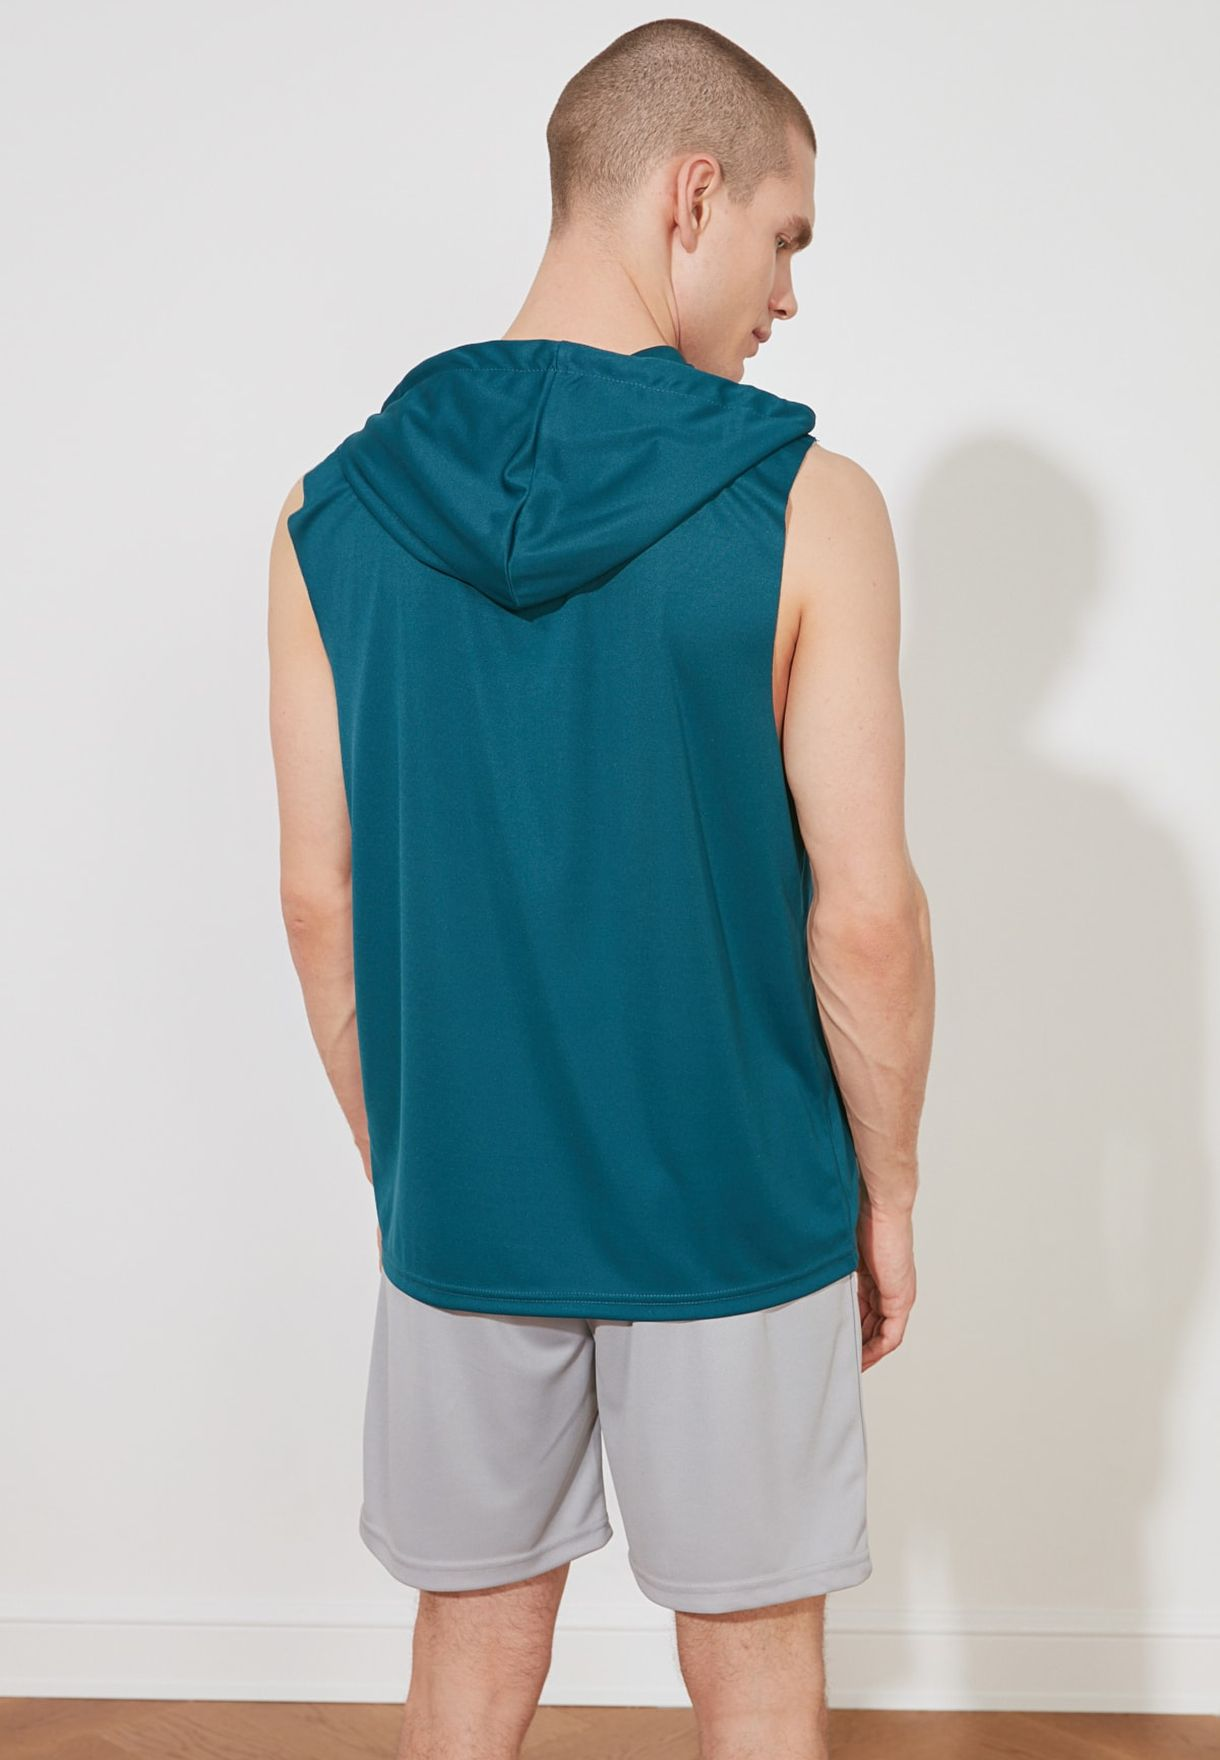 Essential Slim Fit Diving Fabric Sports Undershirt